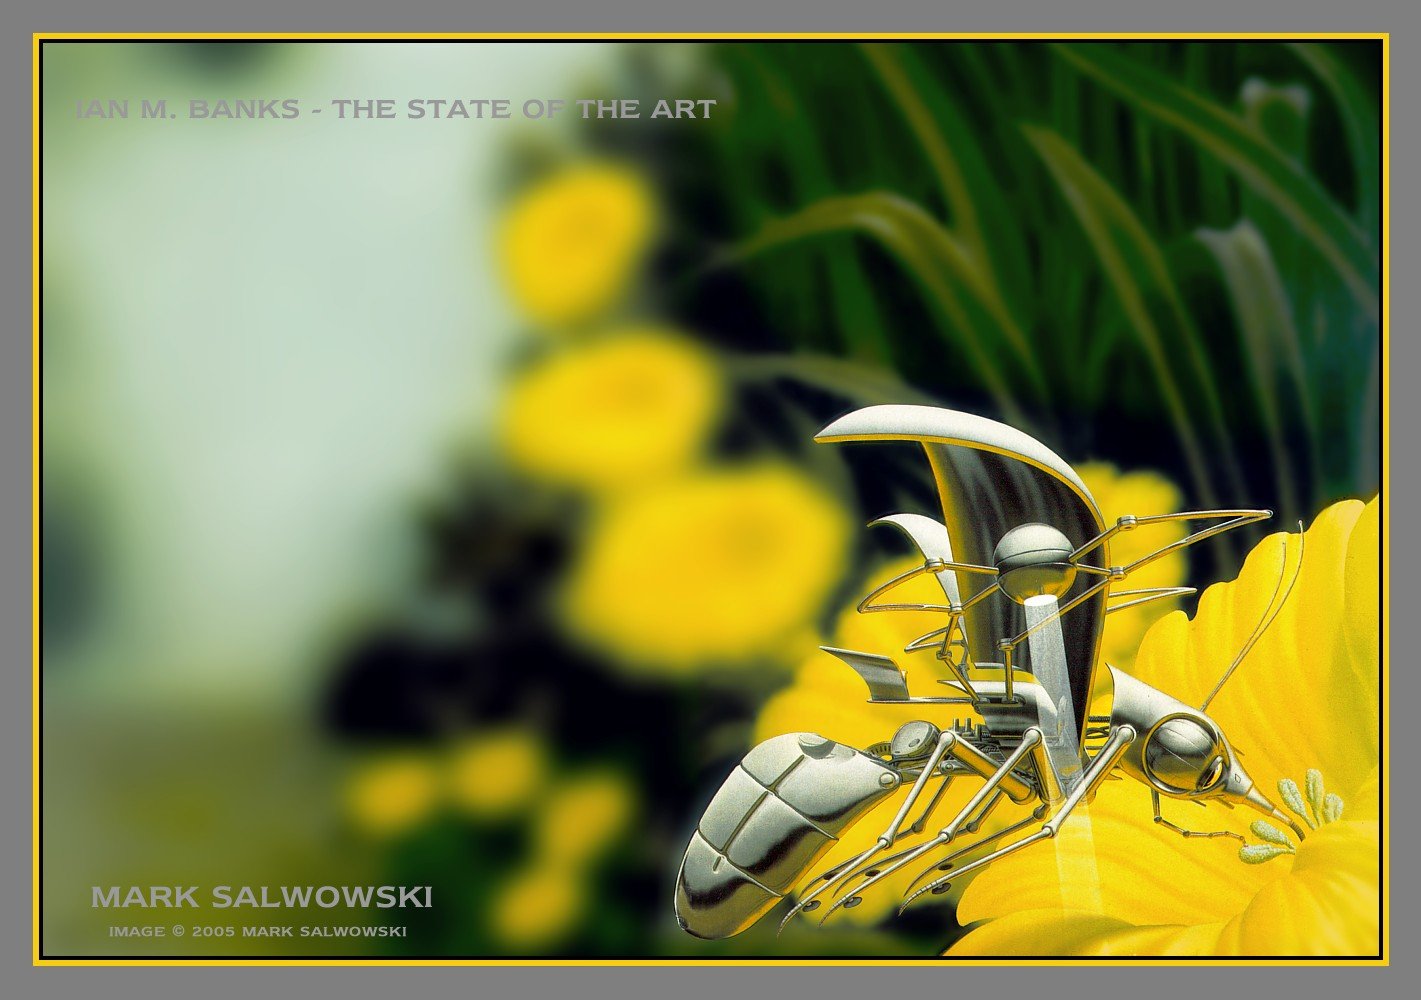 Salwowski_Banks_StateHR.jpg